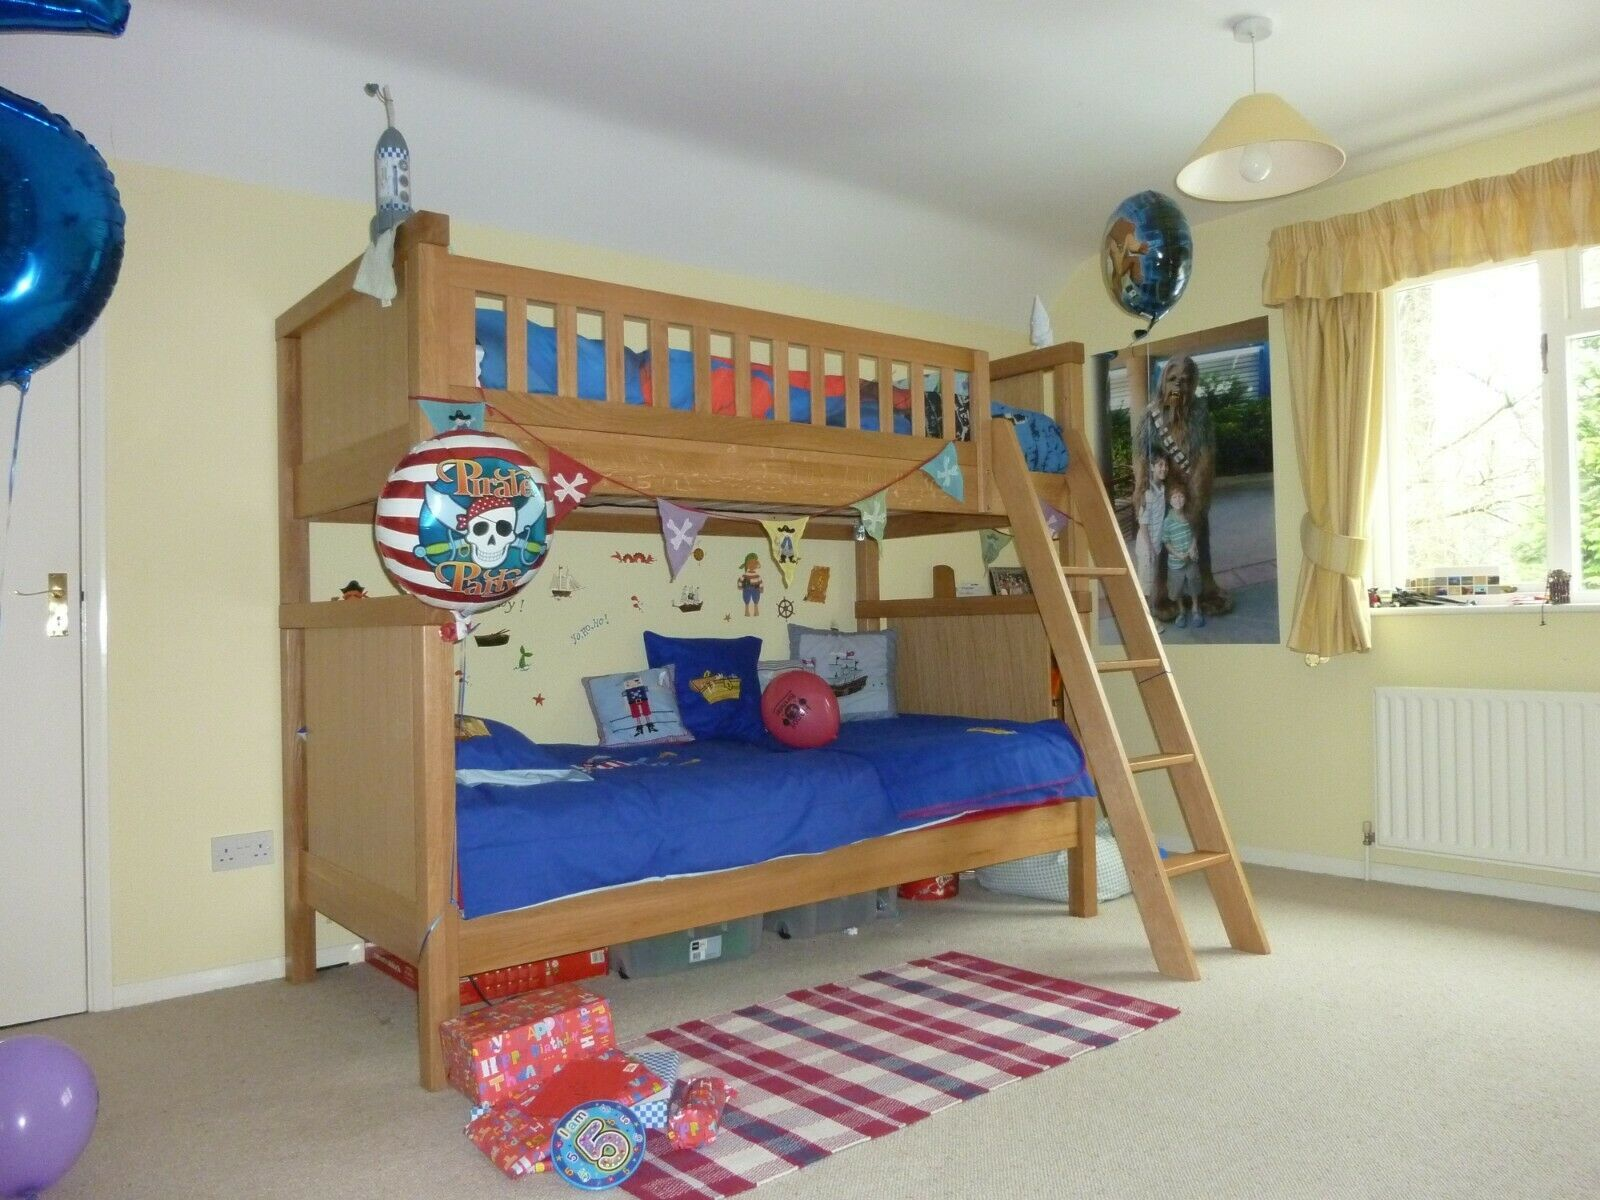 Oak Bunk Beds in 2020 Oak bunk beds, Bunk beds, Bed